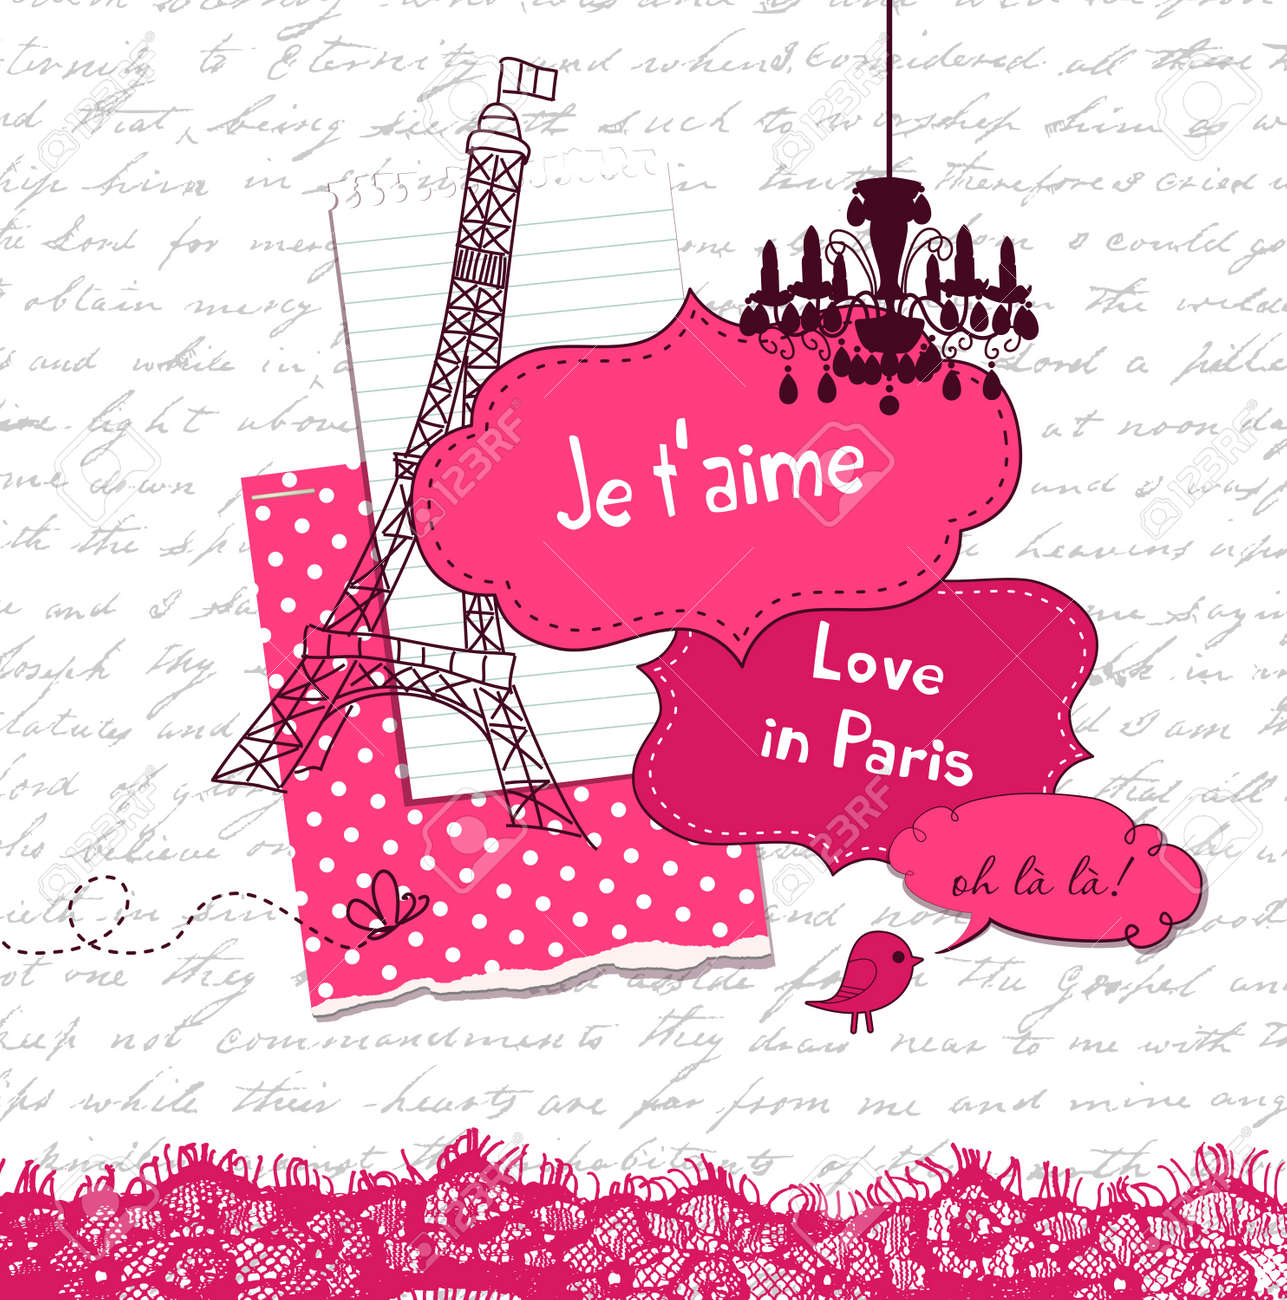 In Love with Paris, Cute scrapbook elements Stock Vector - 12851274